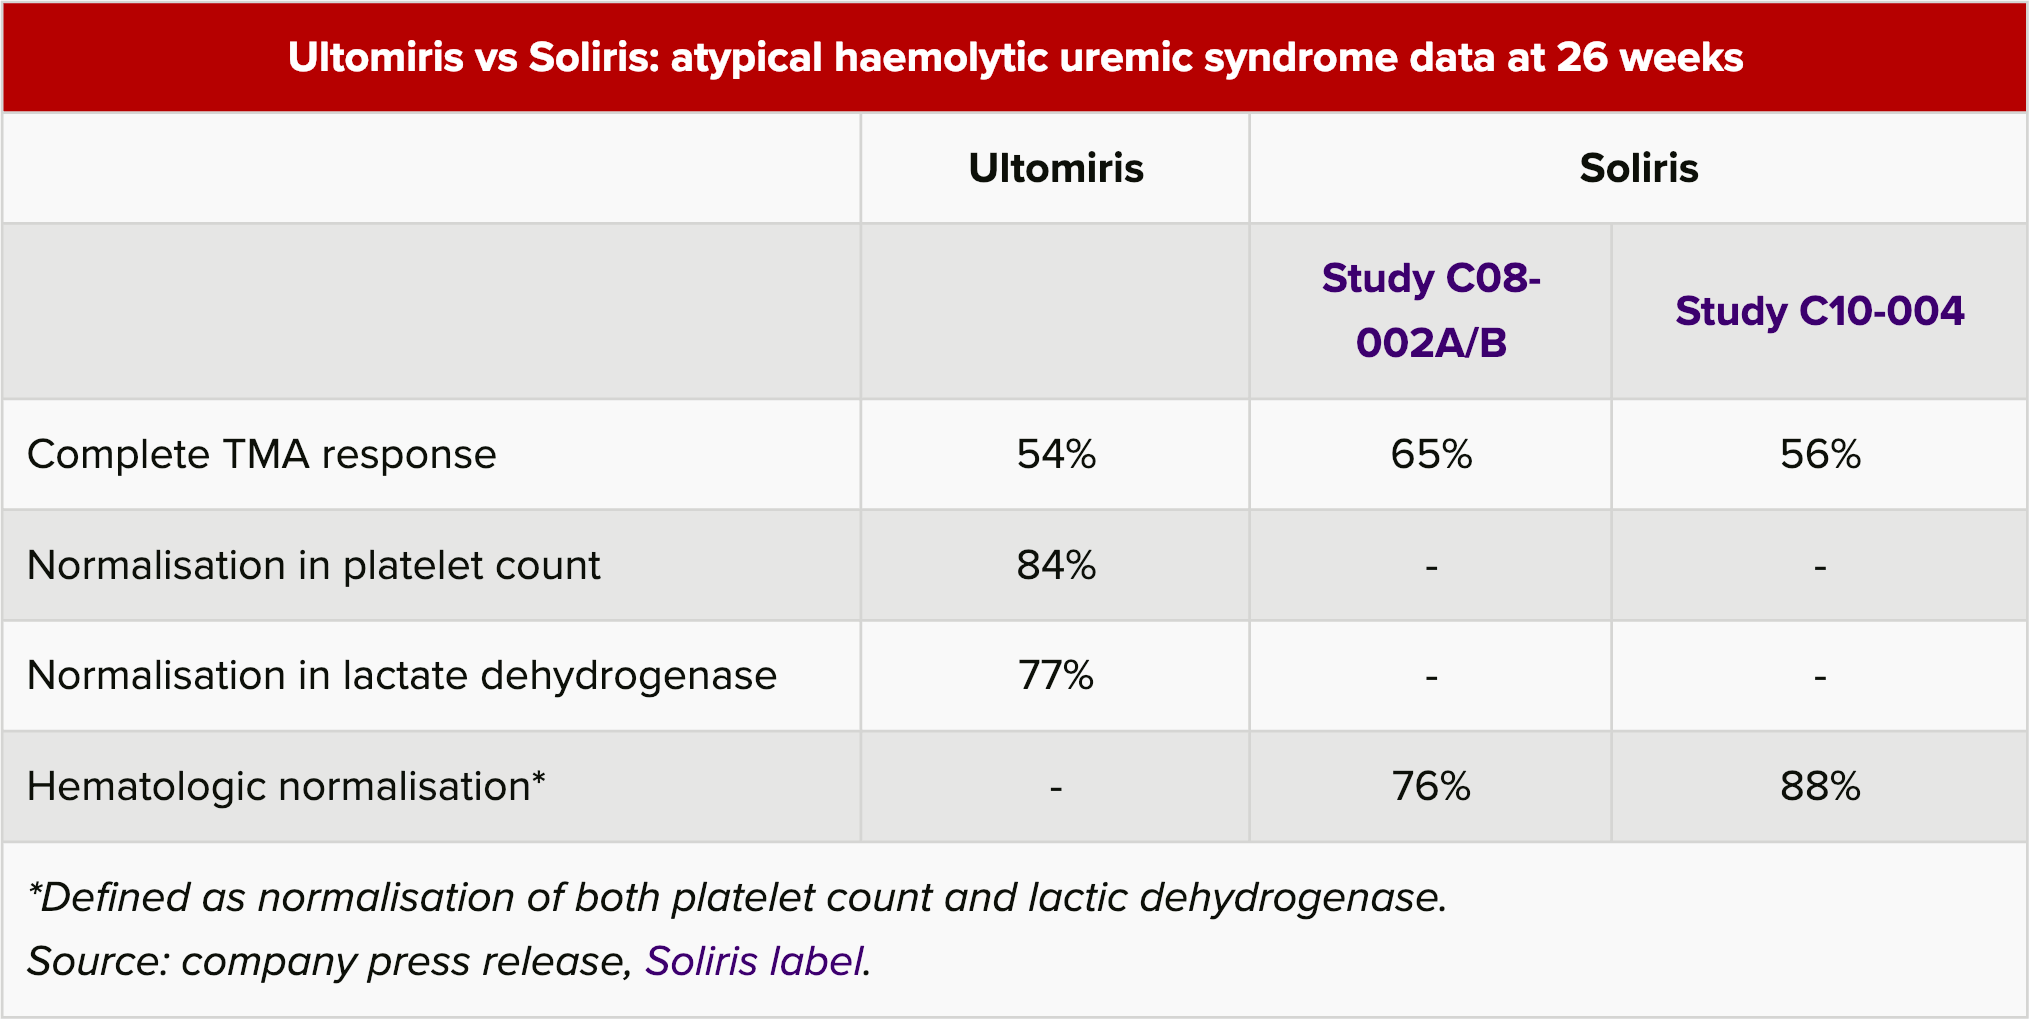 ultomiris vs soliris atypical haemolytic uremic syndrome data at 26 weeks - «Ултомирис»: сын «Солириса» победил атипичный гемолитико-уремический синдром